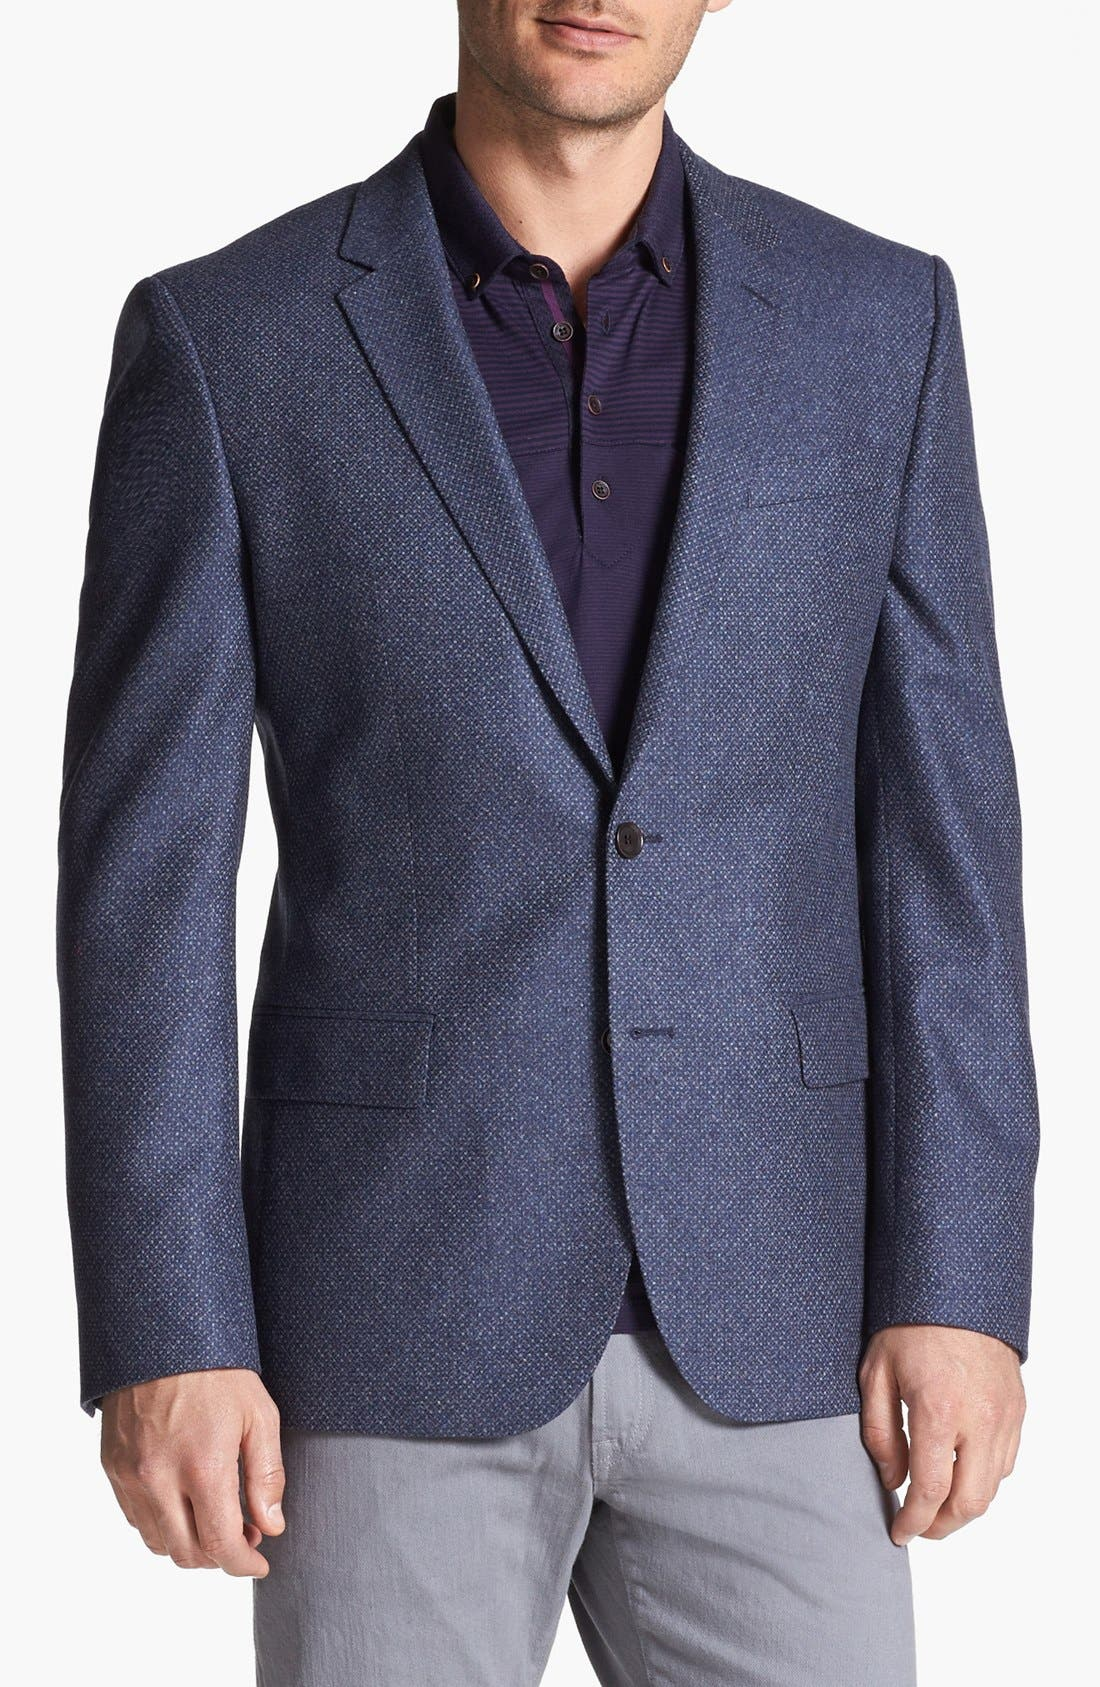 Main Image - BOSS HUGO BOSS 'Hutch' Trim Fit Sportcoat